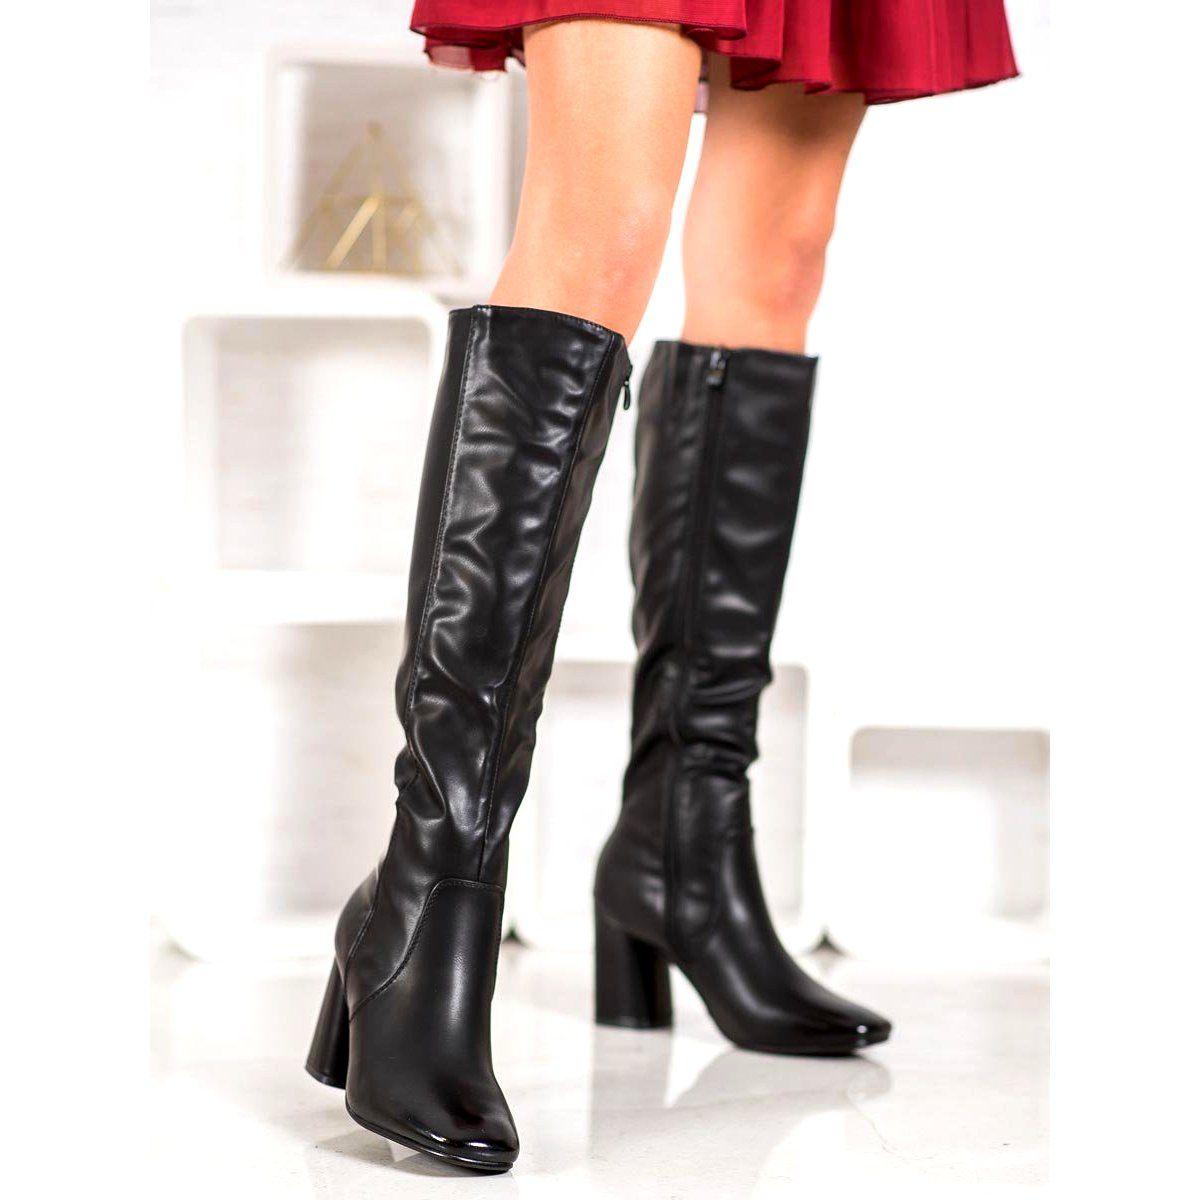 Super Mode Eleganckie Kozaki Z Eko Skory Czarne Boots Over Knee Boot Shoes